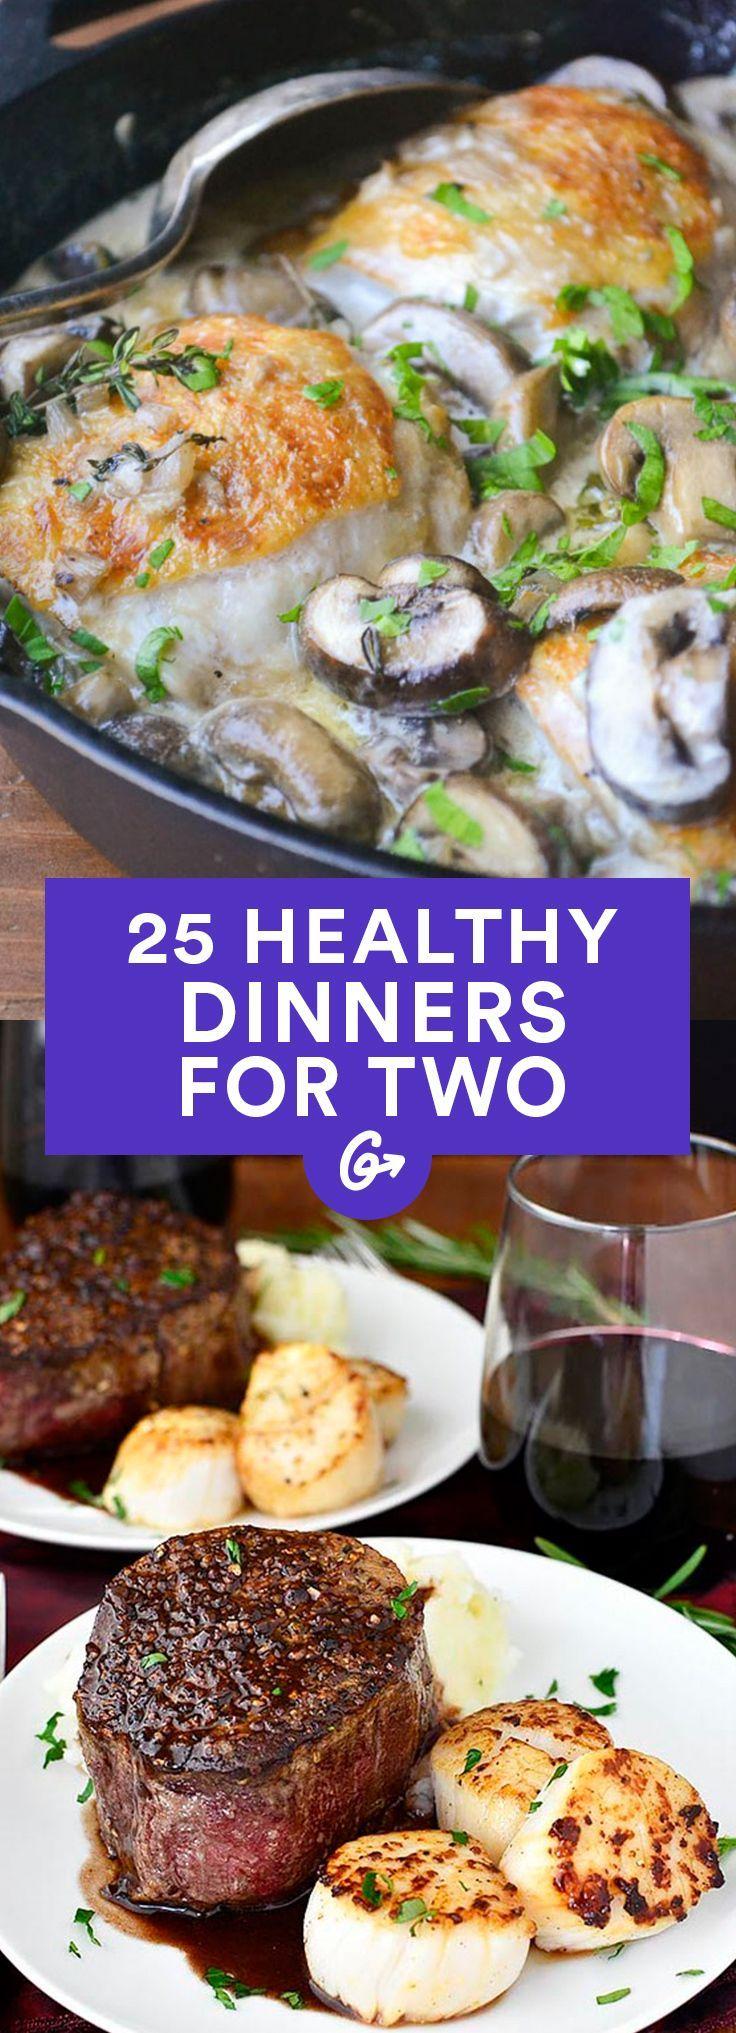 Great Dinner Recipe Ideas